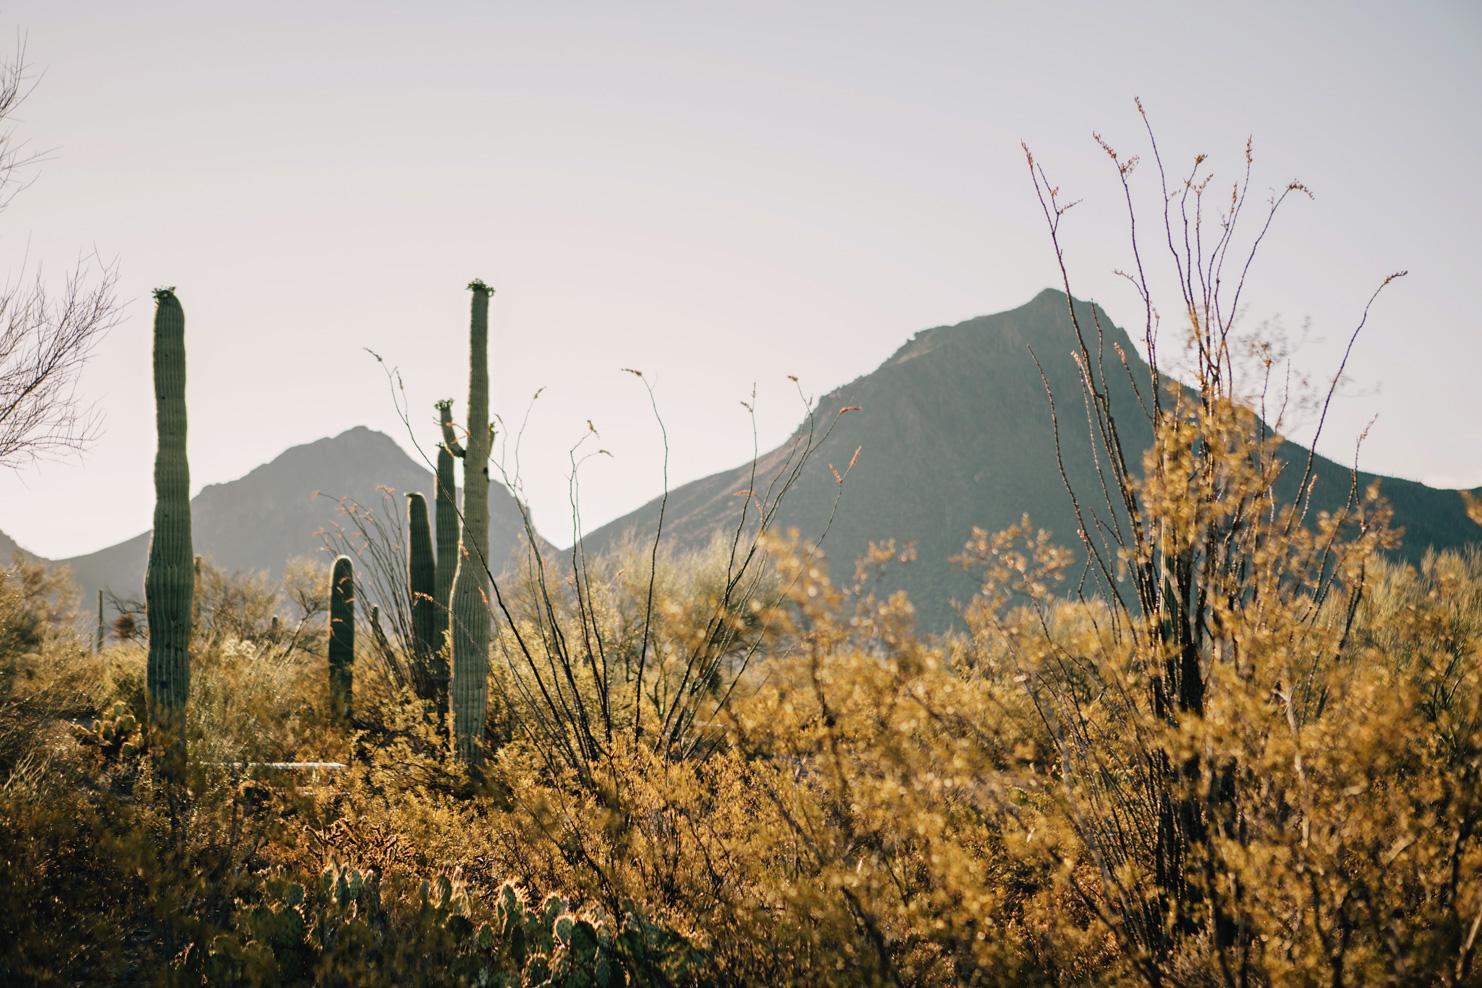 CindyGiovagnoli_Saguaro_National_Park_Tucson_Arizona_flowers_rain_spring_desert-014.jpg